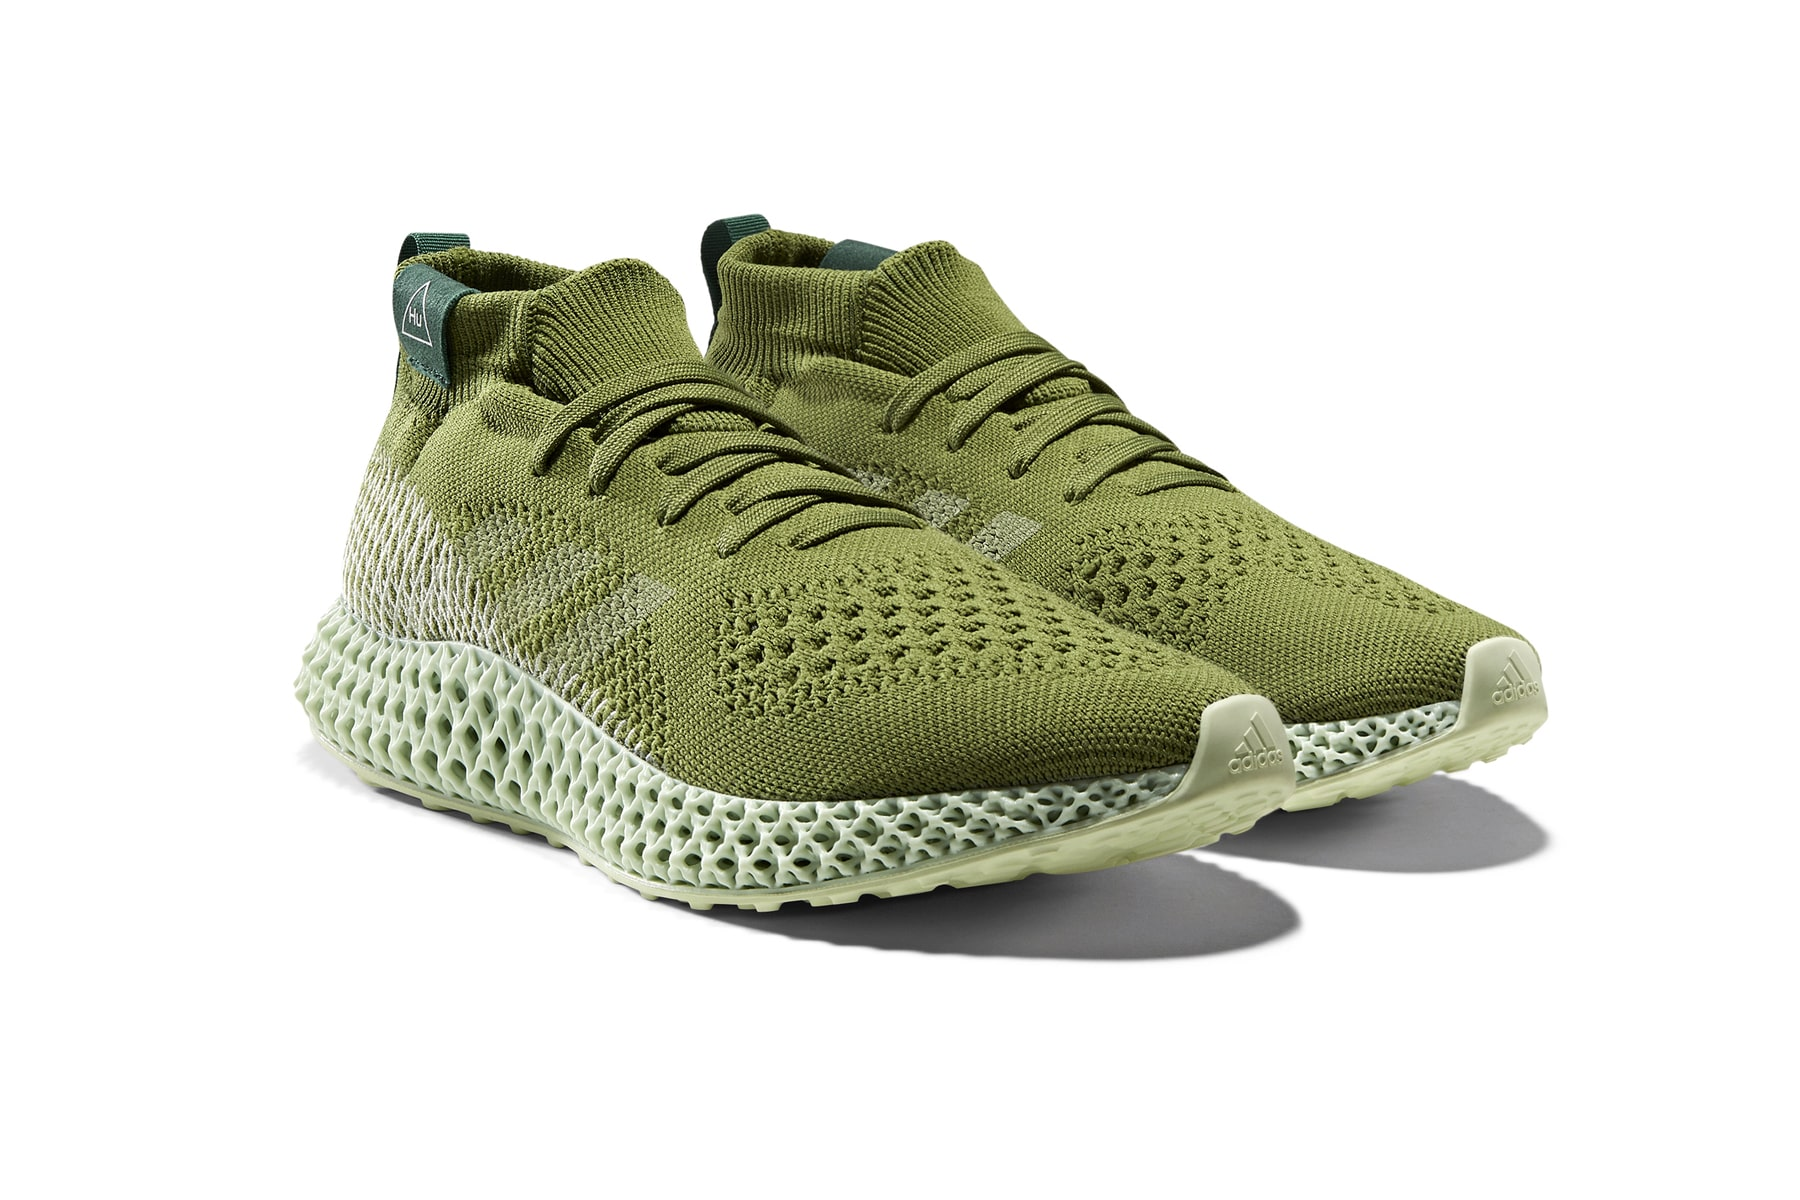 pharrell williams adidas originals 4d runner active purple tech olive release info 4